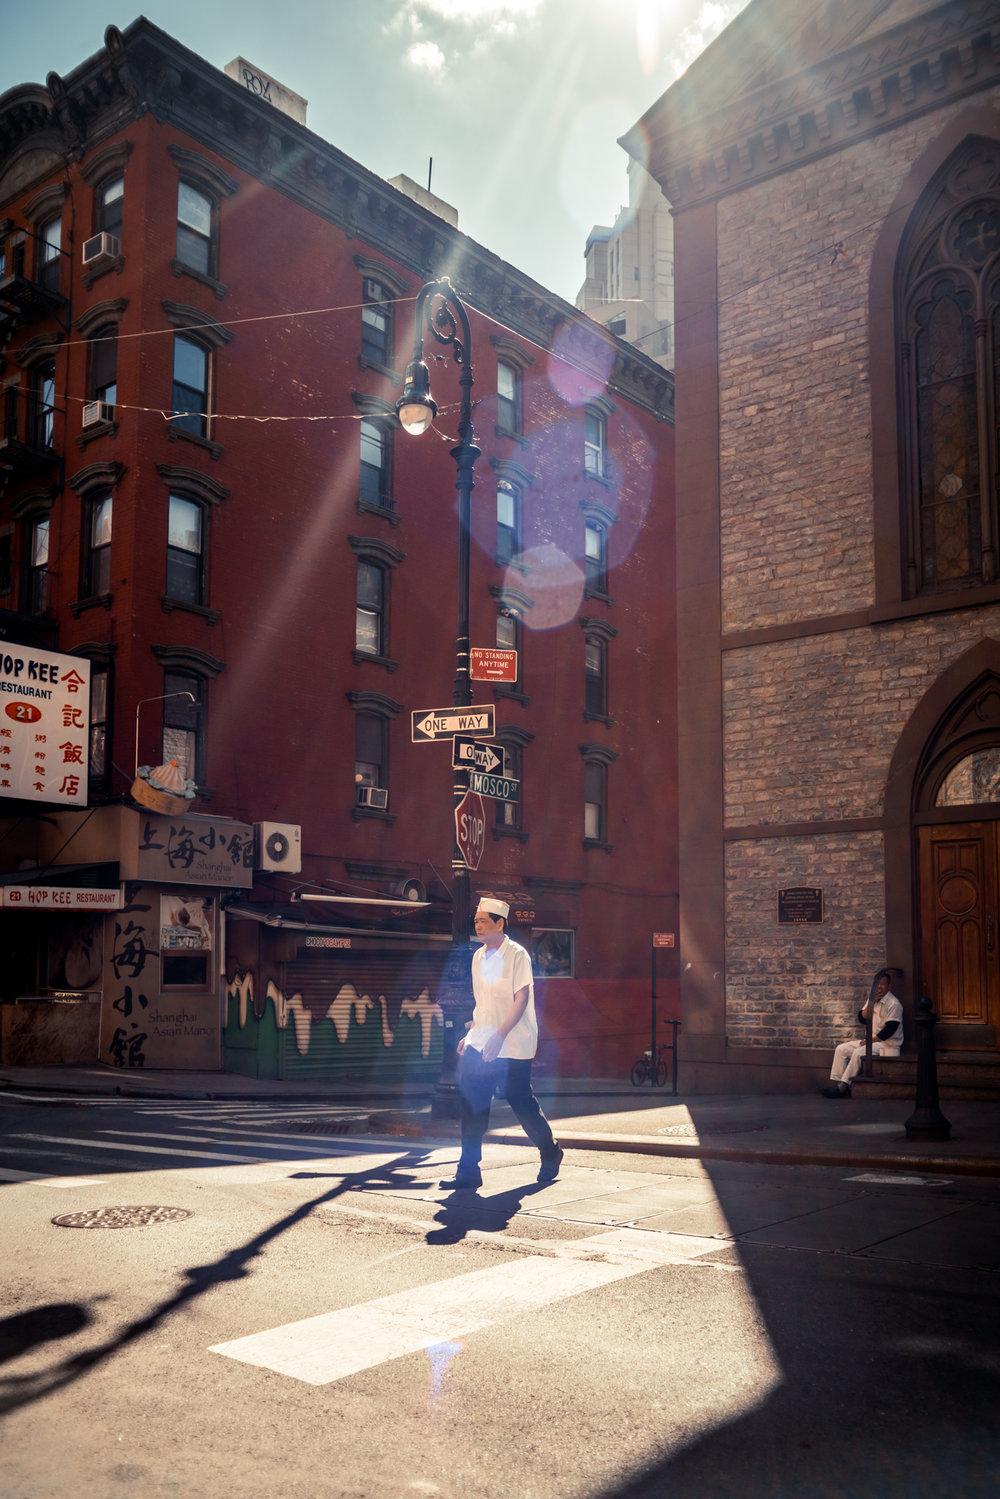 NYC_stijn_hoekstra-71.jpg